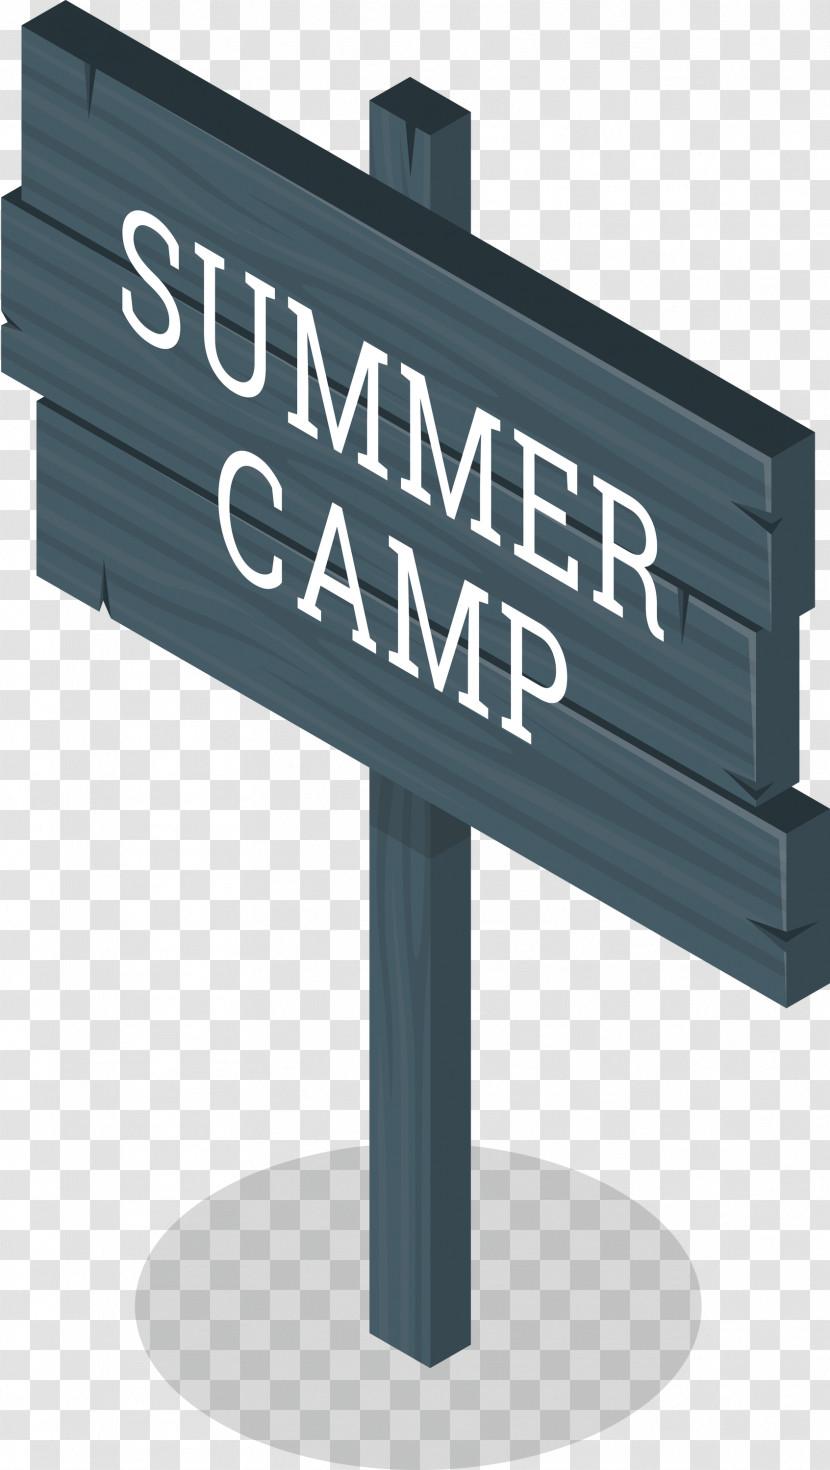 Summer Camp Transparent PNG